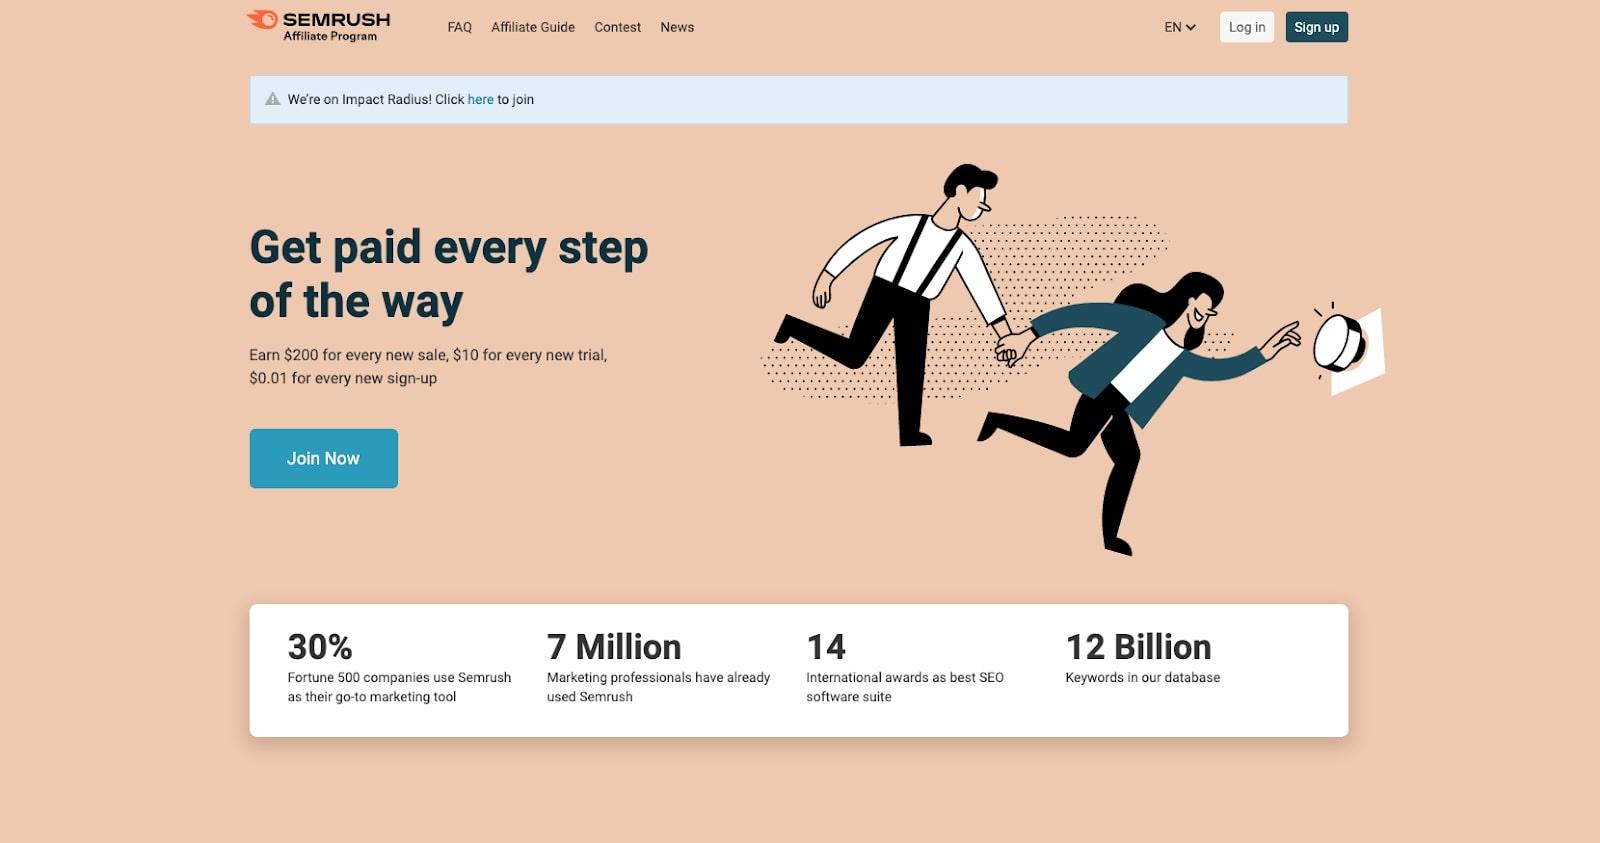 Screenshot of Semrush affiliate program website